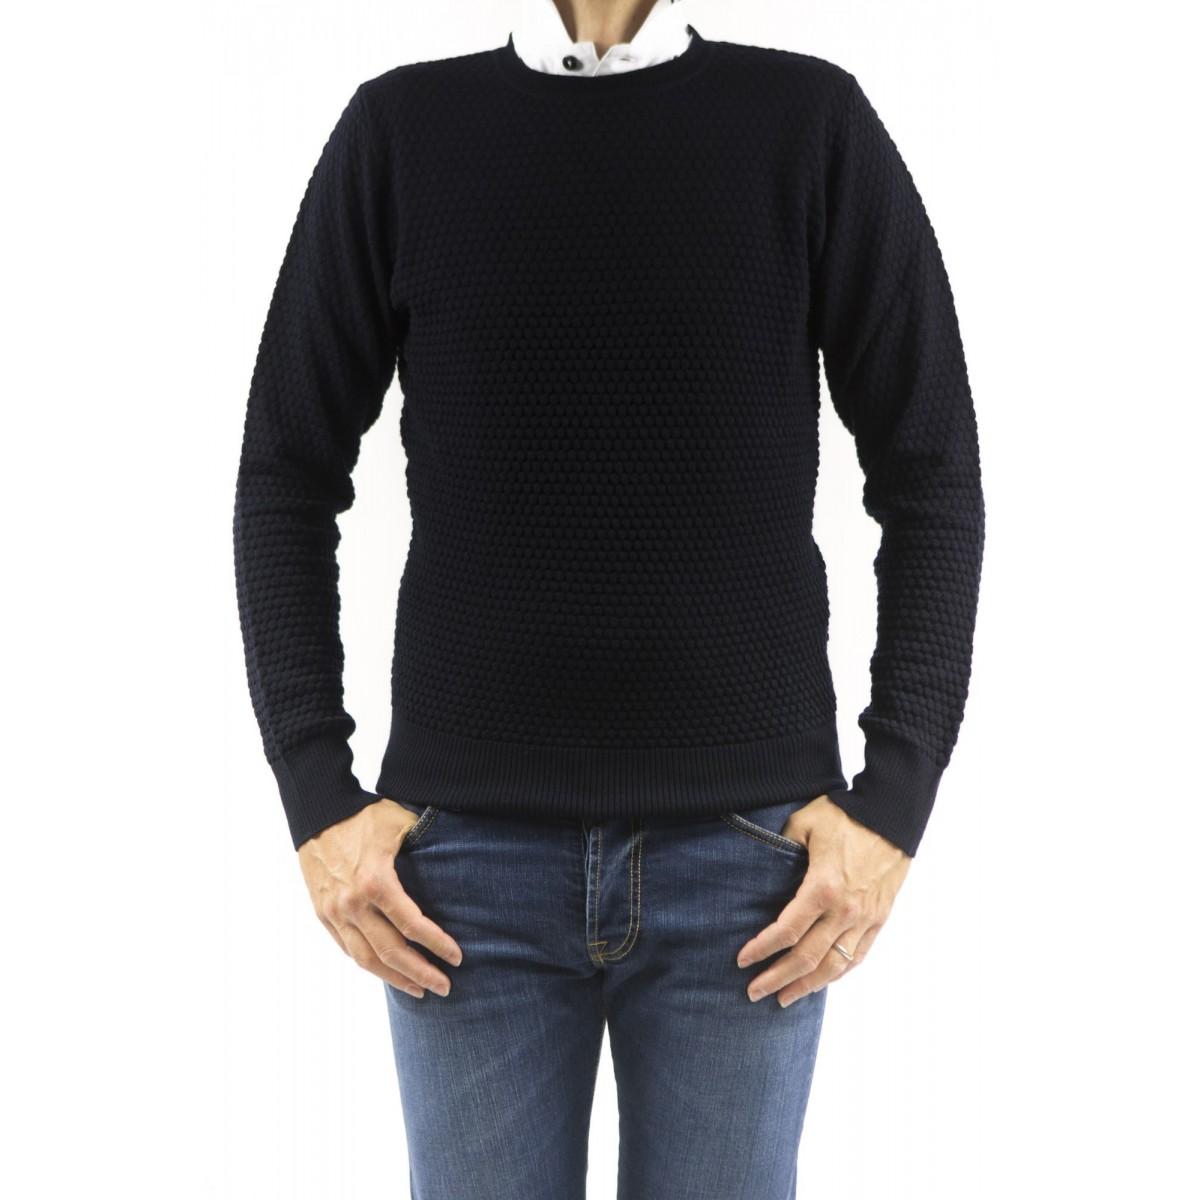 Pullover Kangra Herren - 9016 /01 41 - BLU SCURO